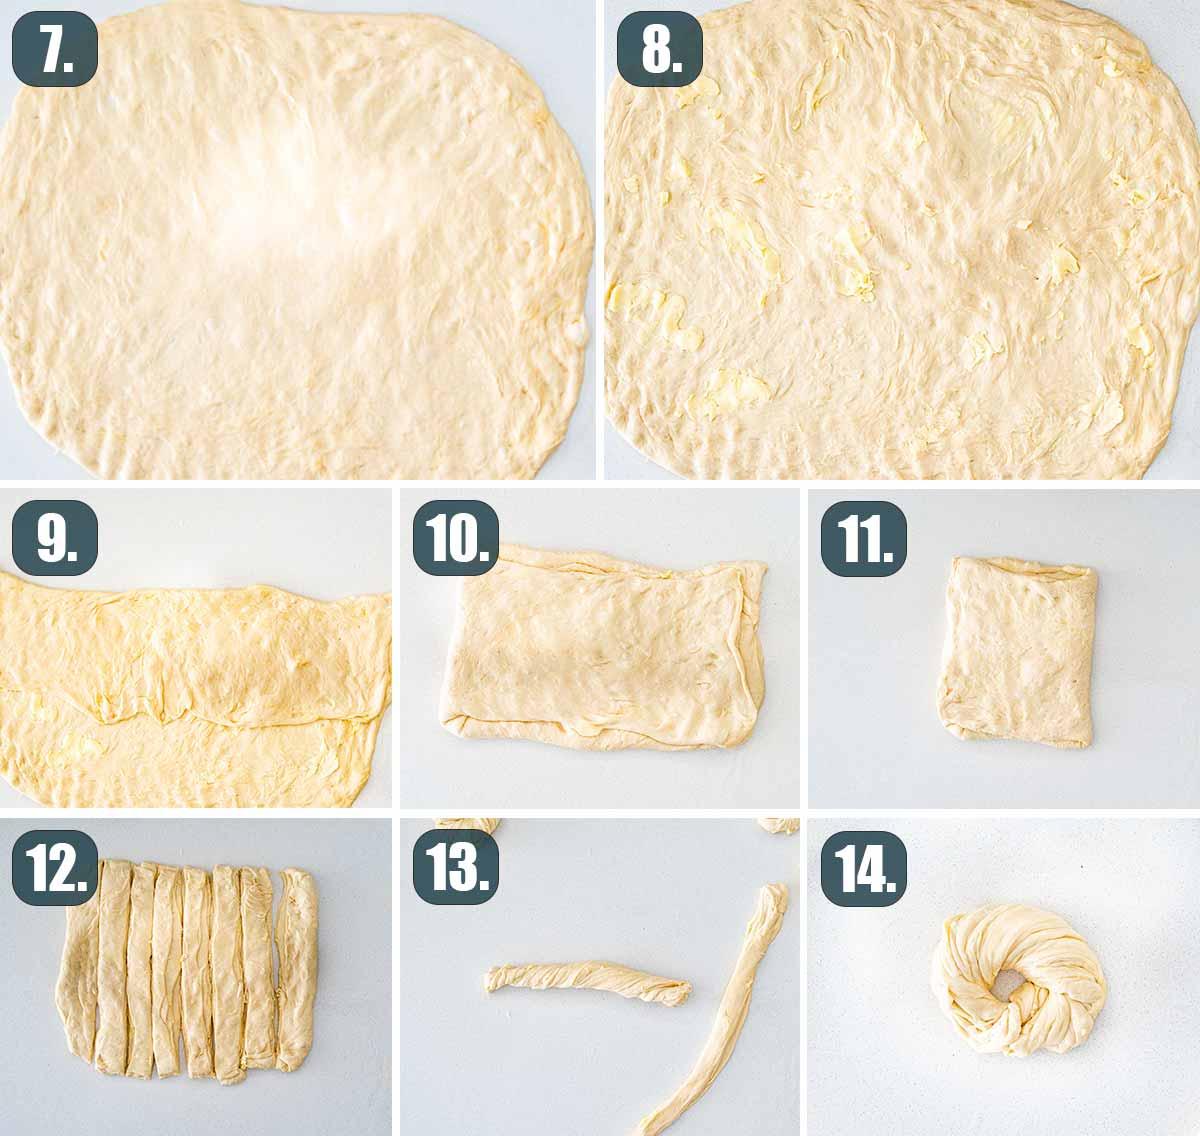 process shots showing how to shape the dough to make brioche buns.